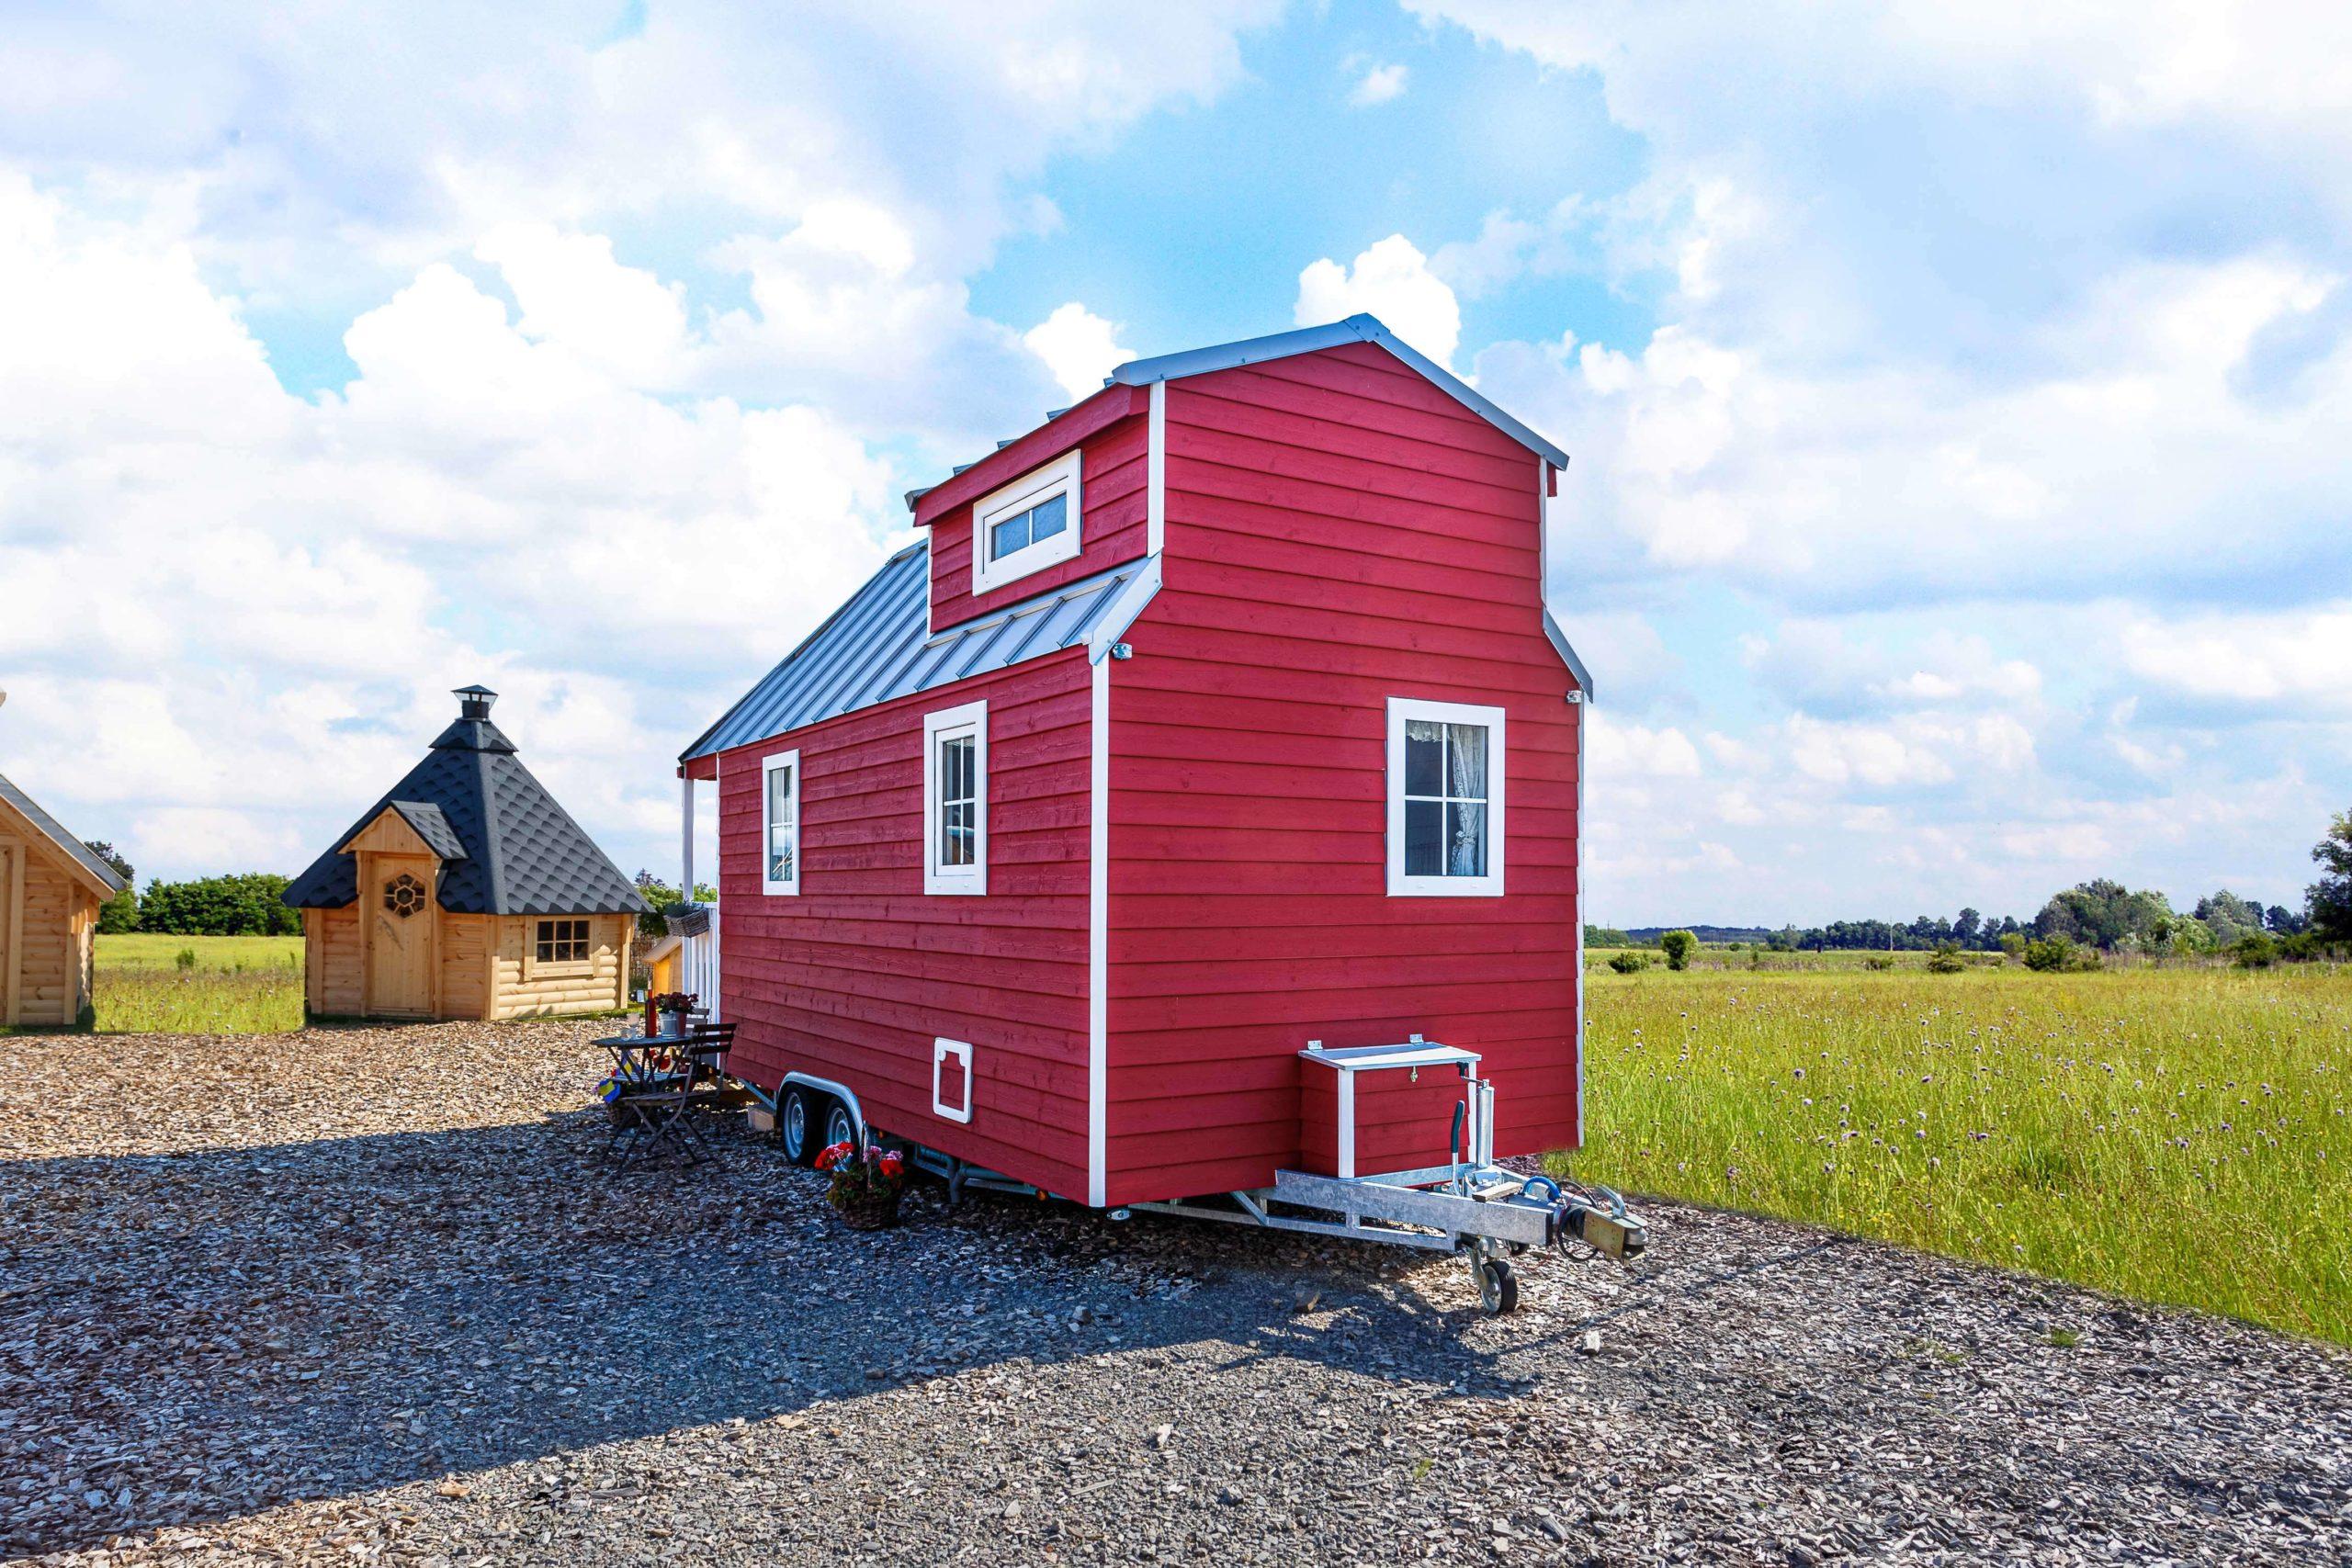 mobiles-tiny-house-schweden-vital-camp-gmbh-05